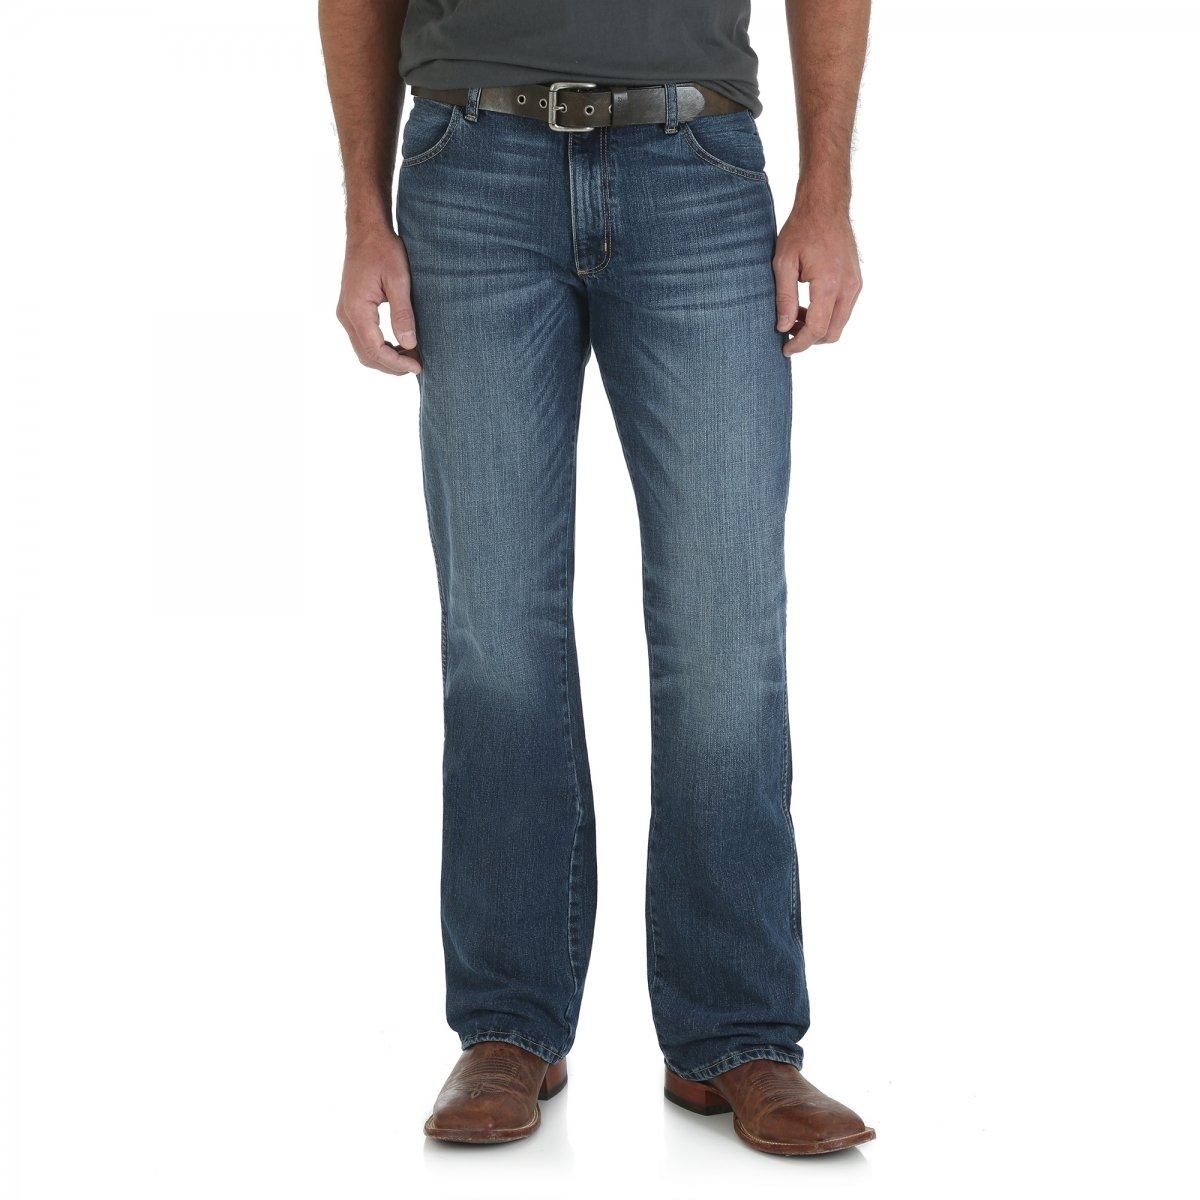 Wrangler Men's Retro Slim Fit Boot Cut Jean, Scottsdale, 34W x 32L